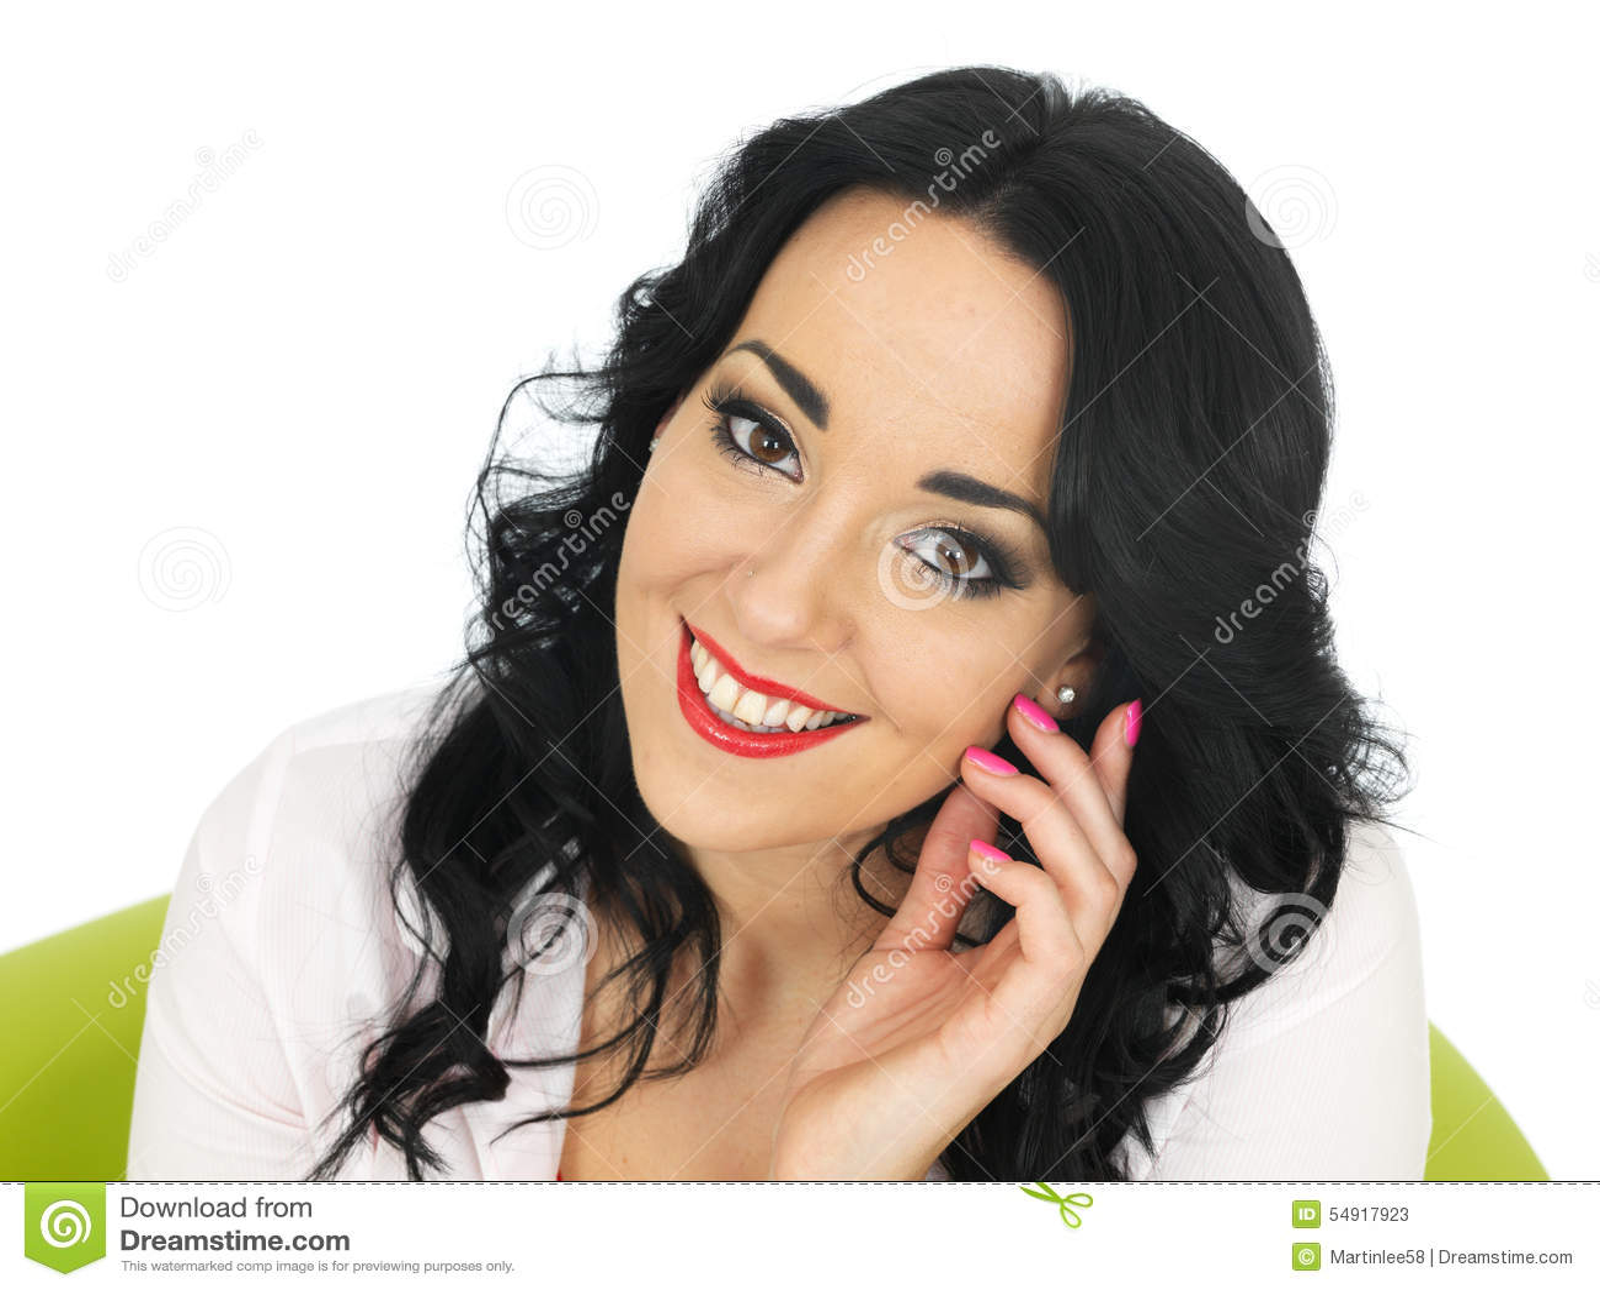 Giovane donna ispana attraente premurosa contenta rilassata felice